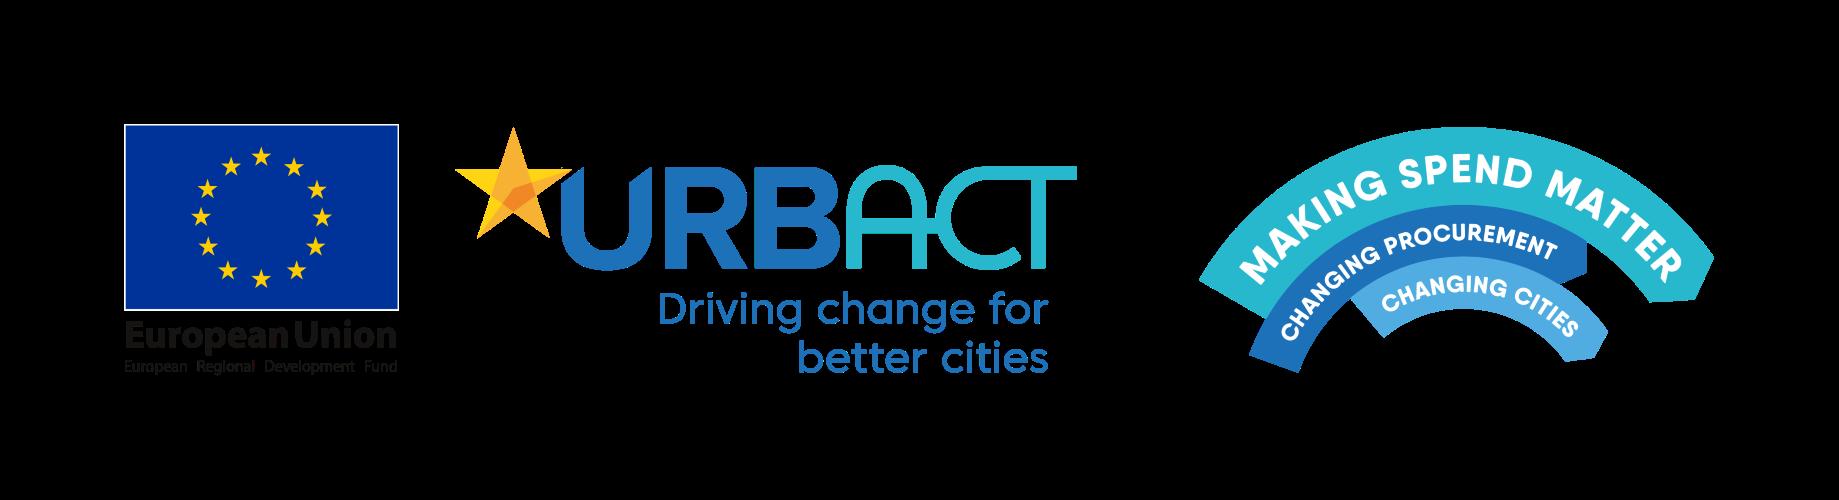 European Union, URBACT and Making Spend Matter logos